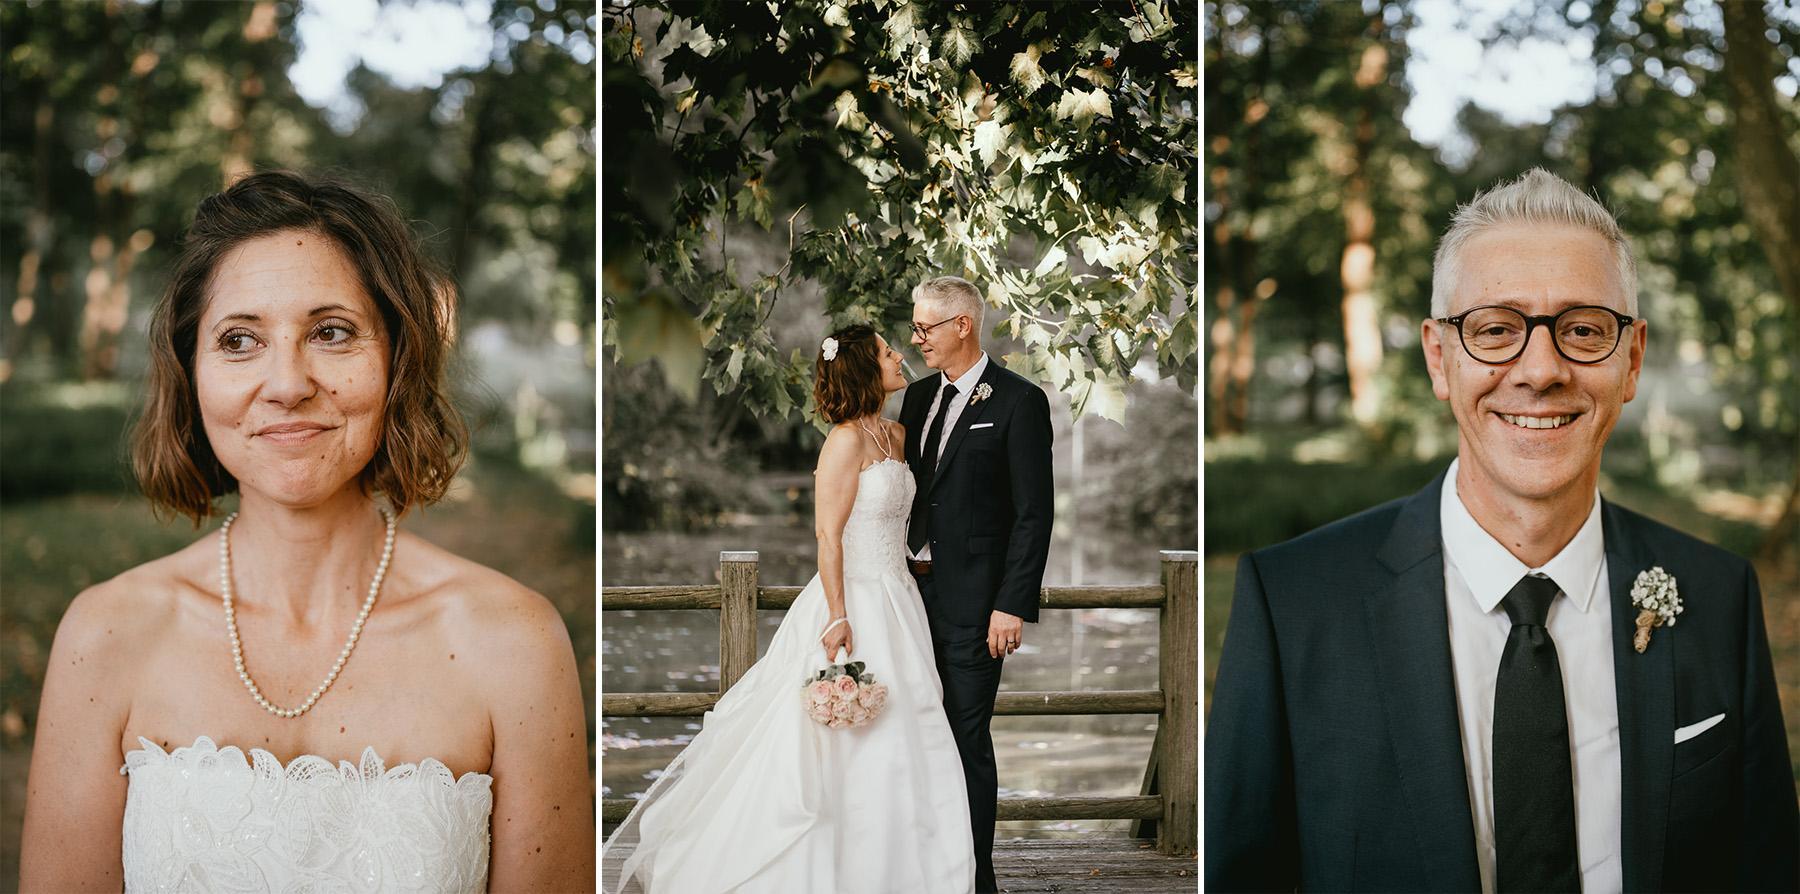 Photographe mariage landes dax aquitaine 9